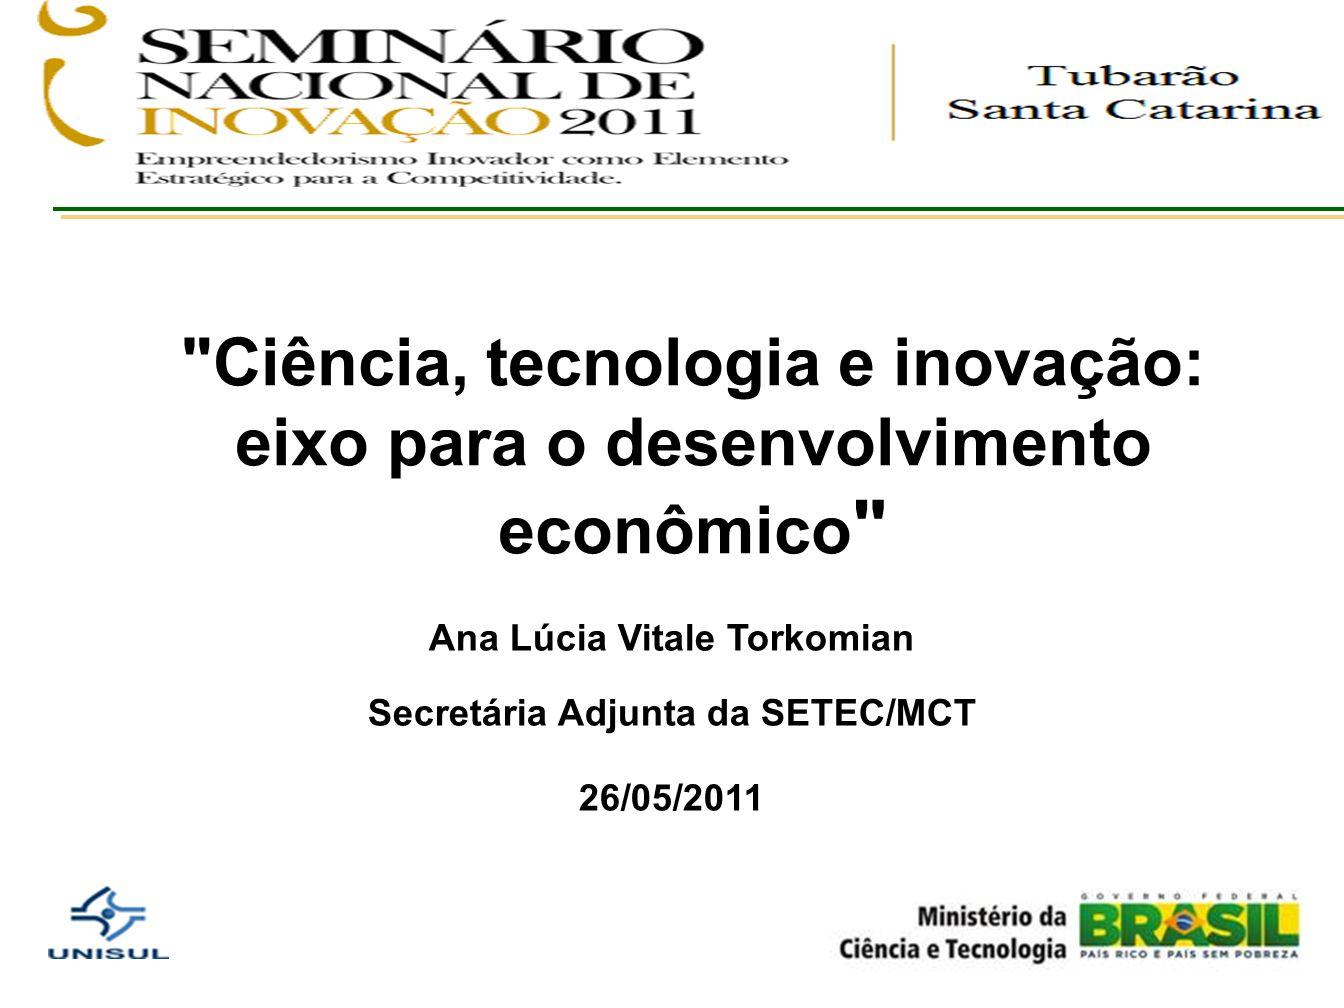 Ana Lúcia Vitale Torkomian Secretária Adjunta da SETEC/MCT